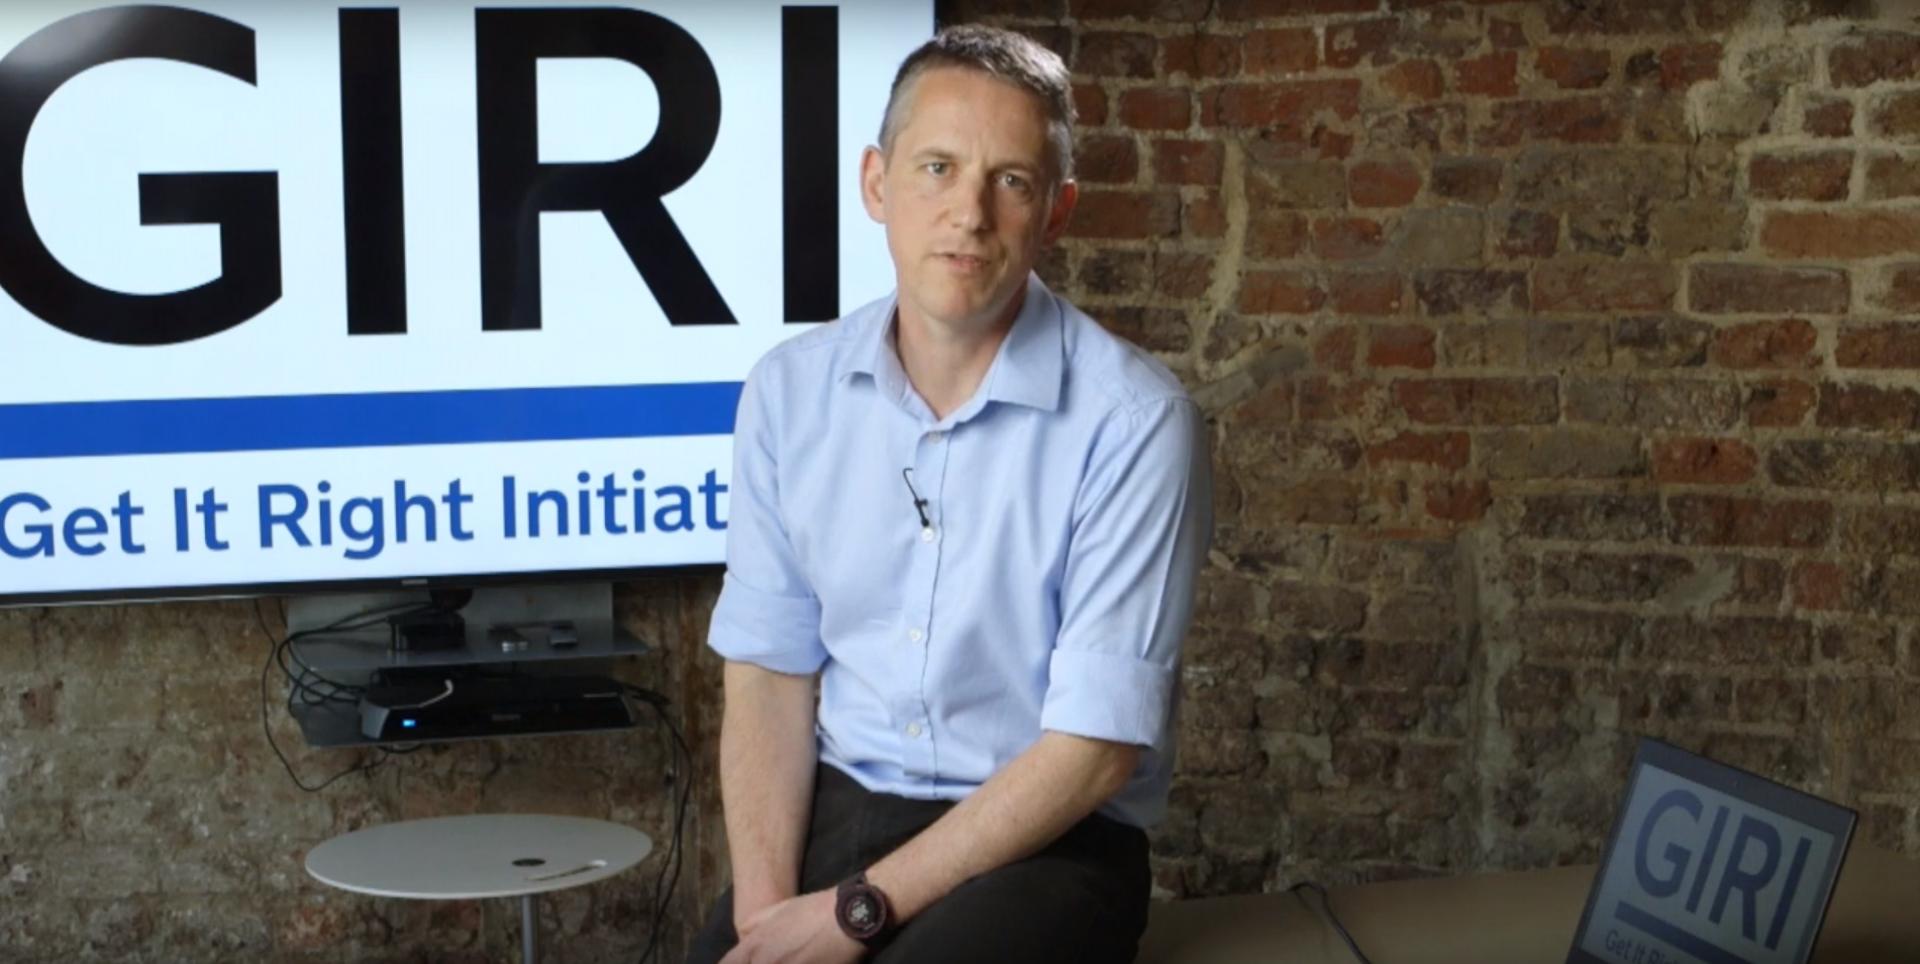 GIRI Training introductory video